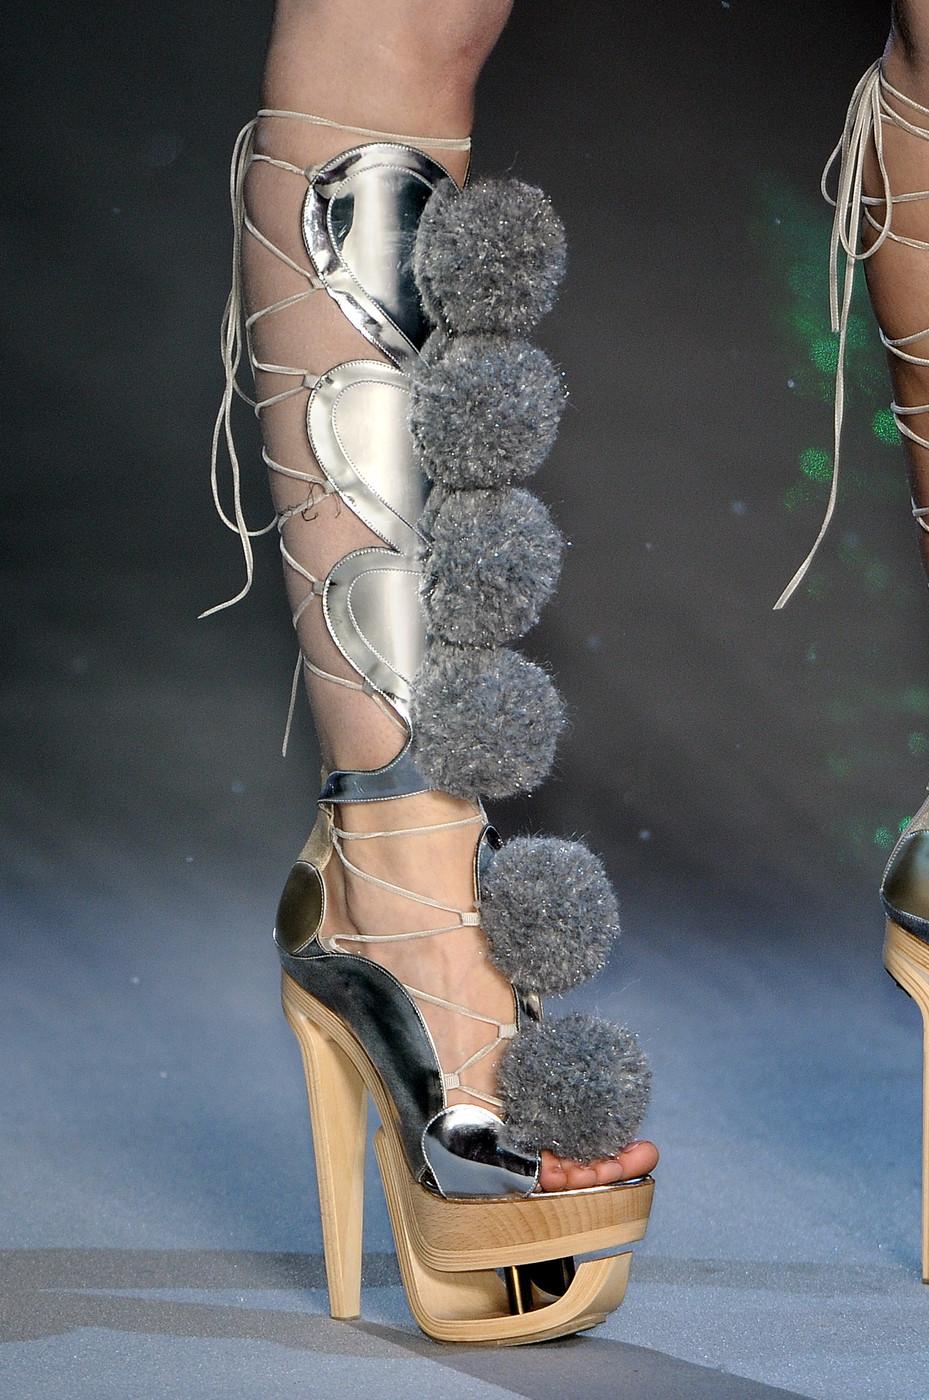 Файл:John Galliano Fall 2009 Lace-Up Pom Pom Sandals.jpg